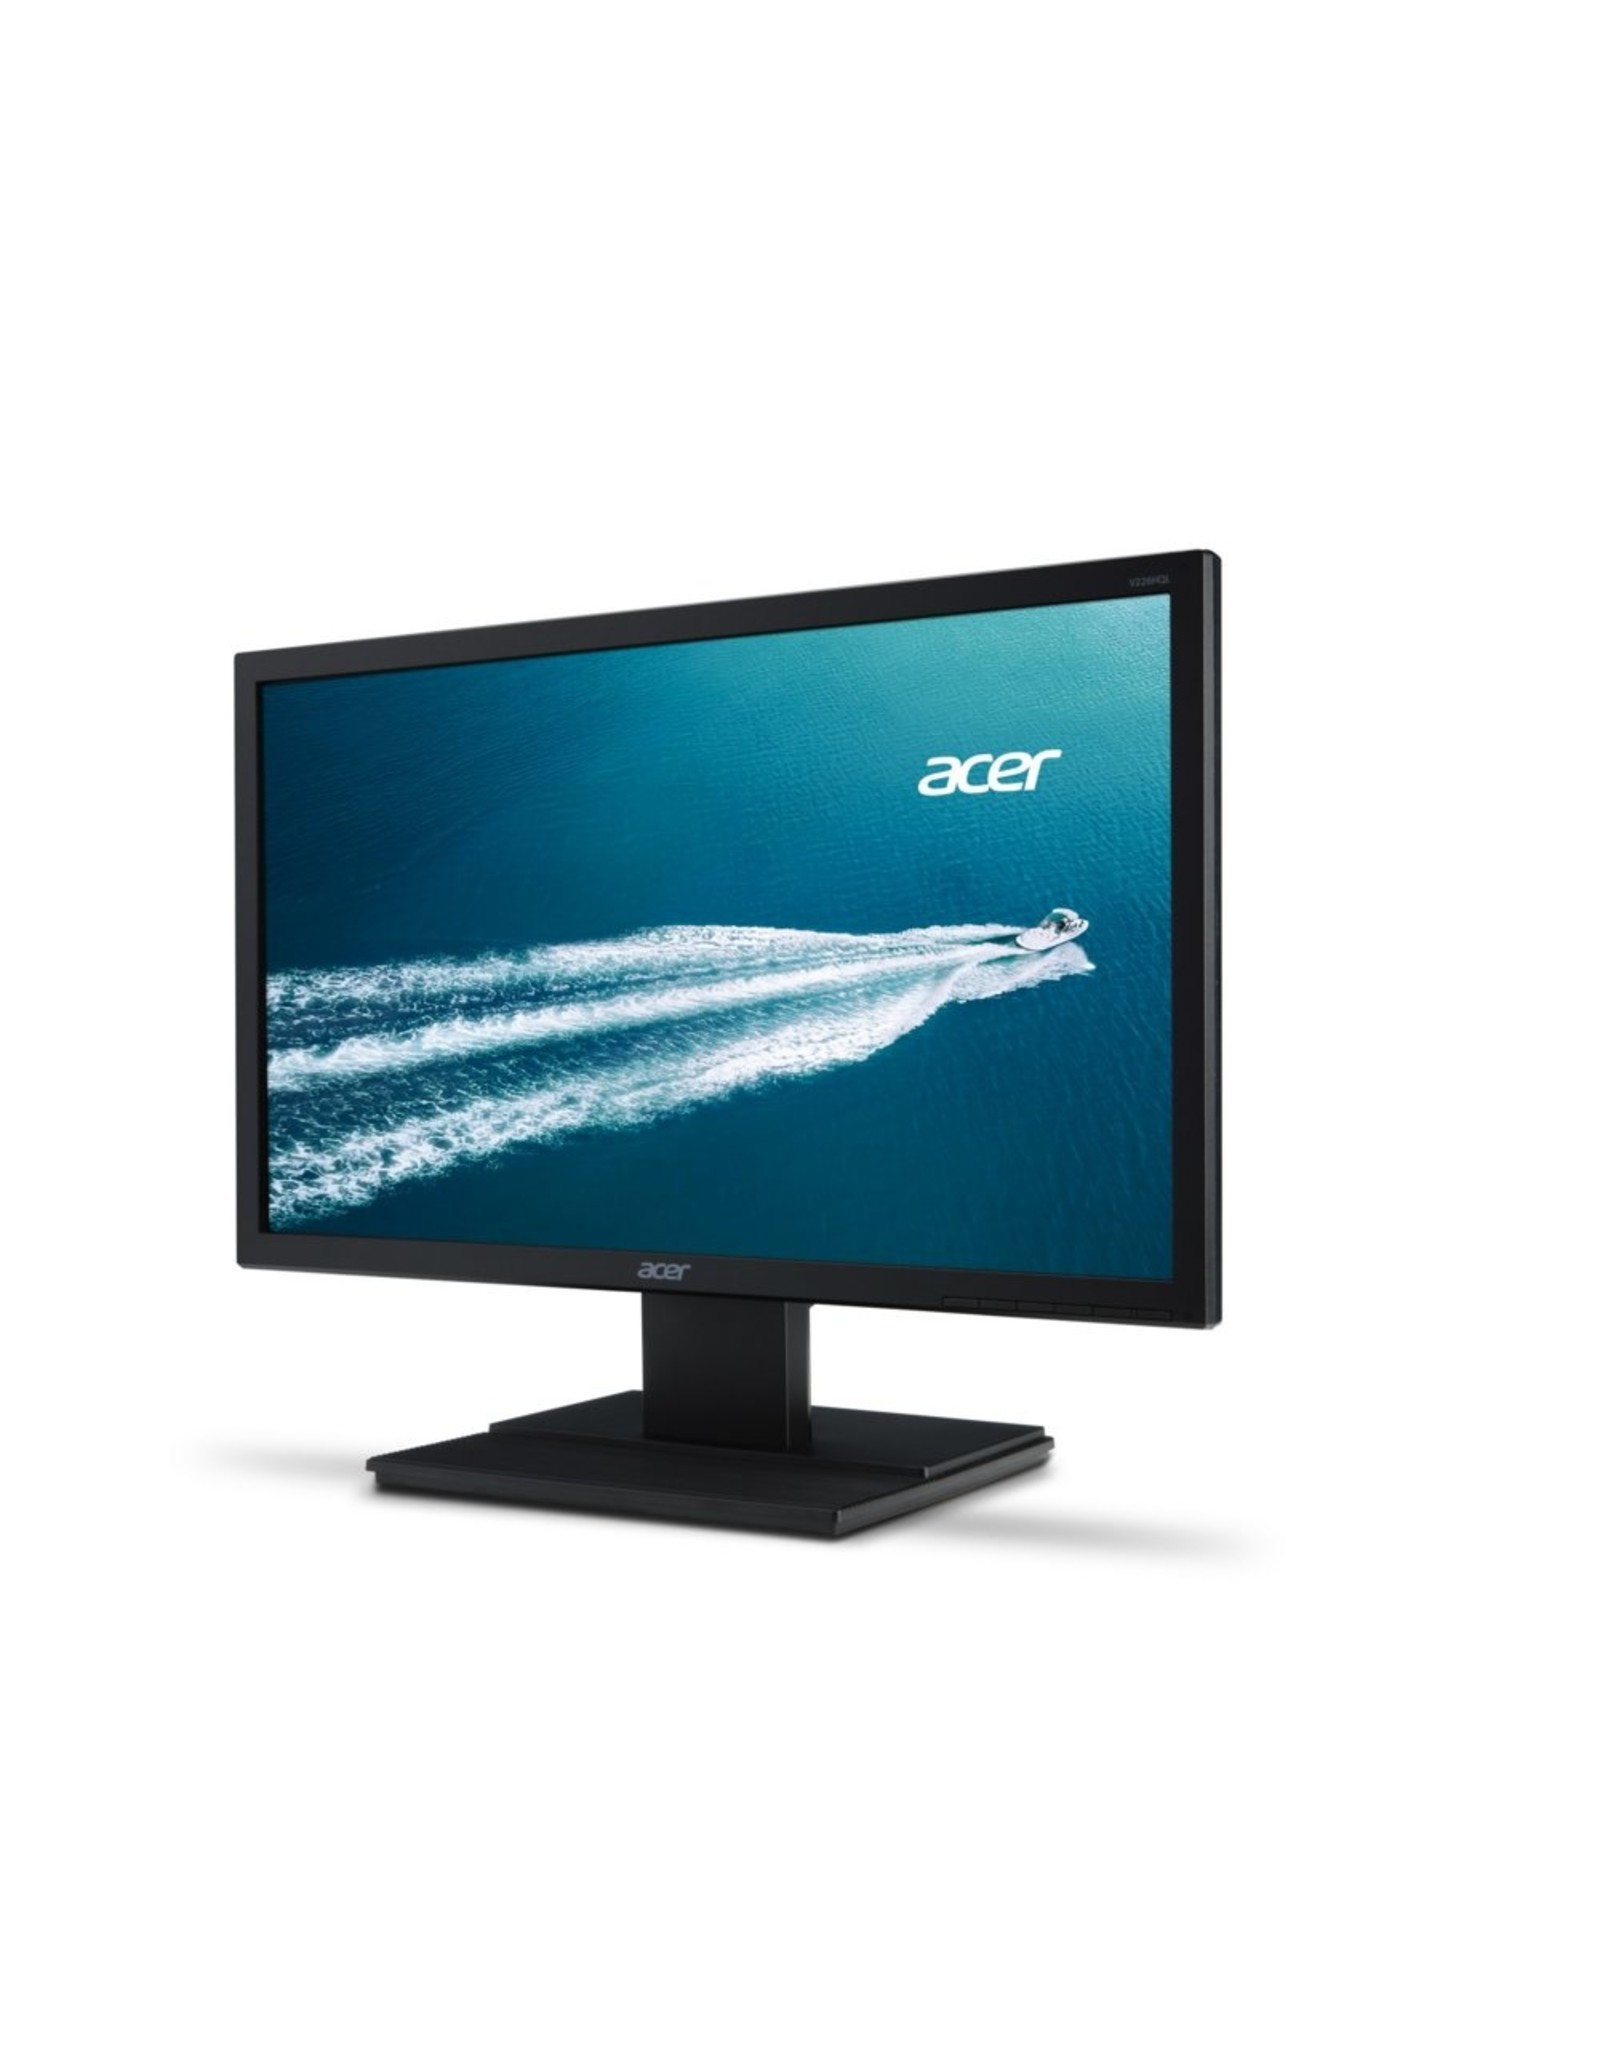 Acer Mon  21.5  F-HD / DVI / VGA / Black (refurbished)